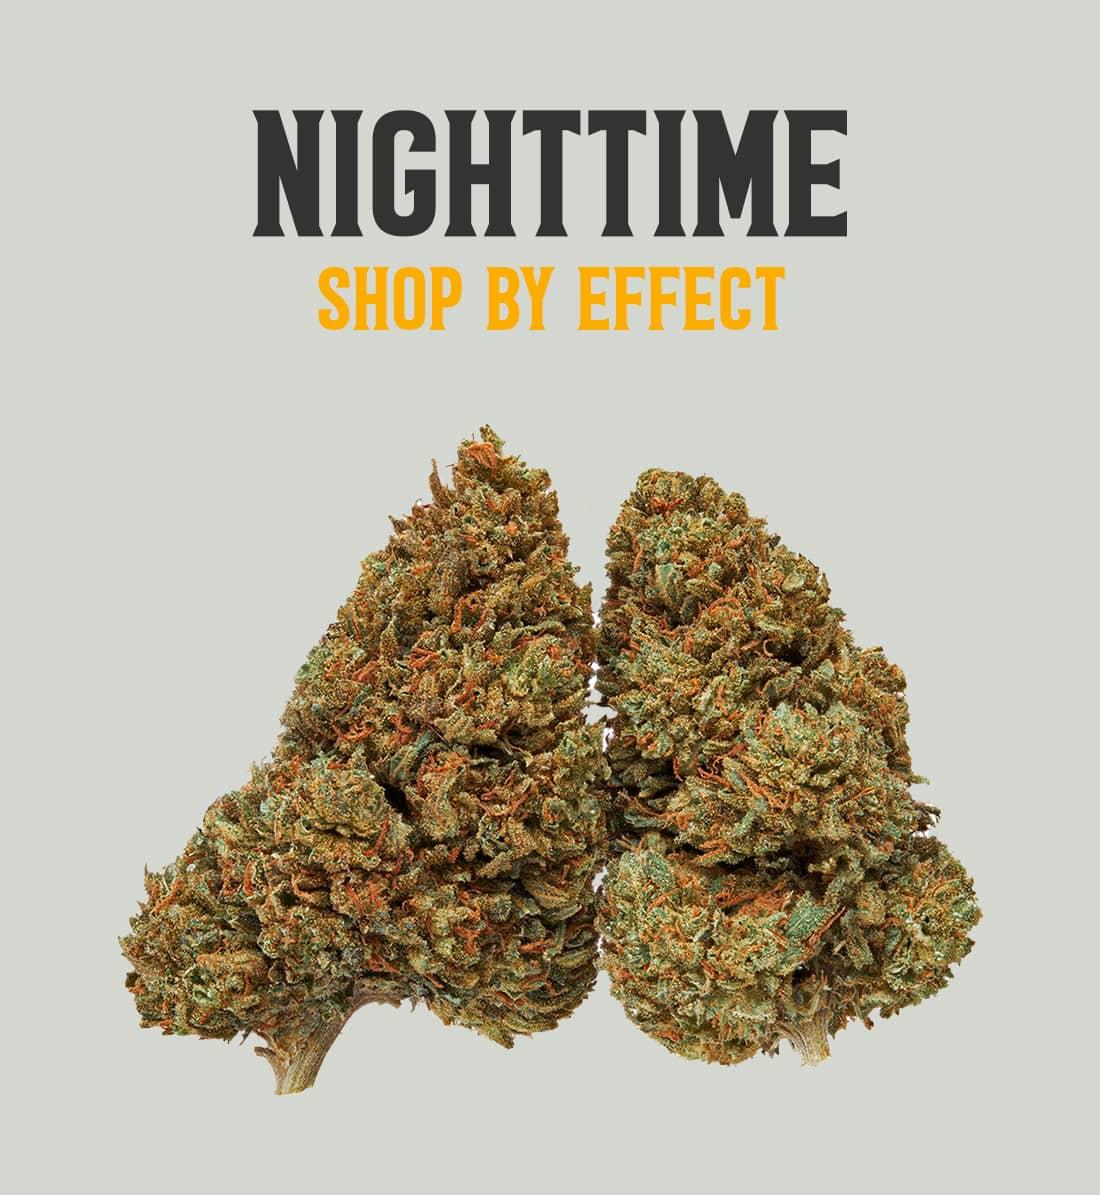 Nighttime CBD Flower